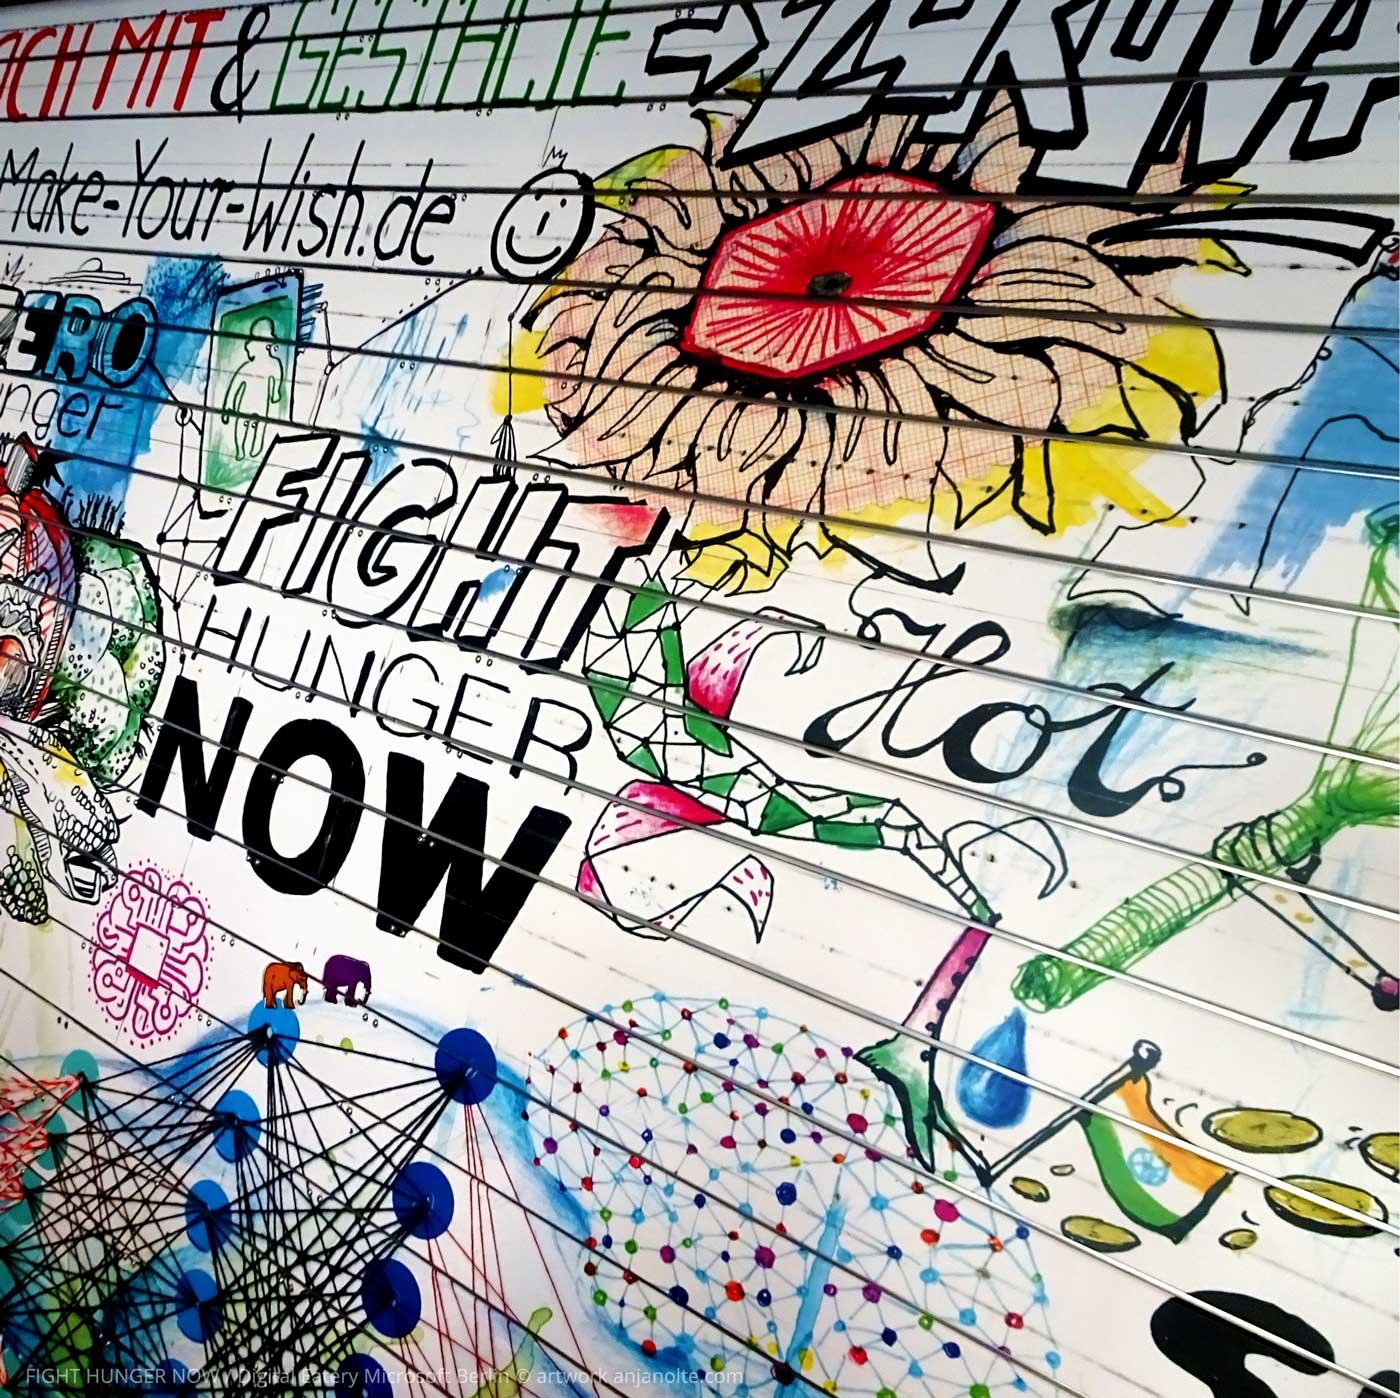 Artwork from Anja Nolte in Digital Eatery Microsoft Berlin